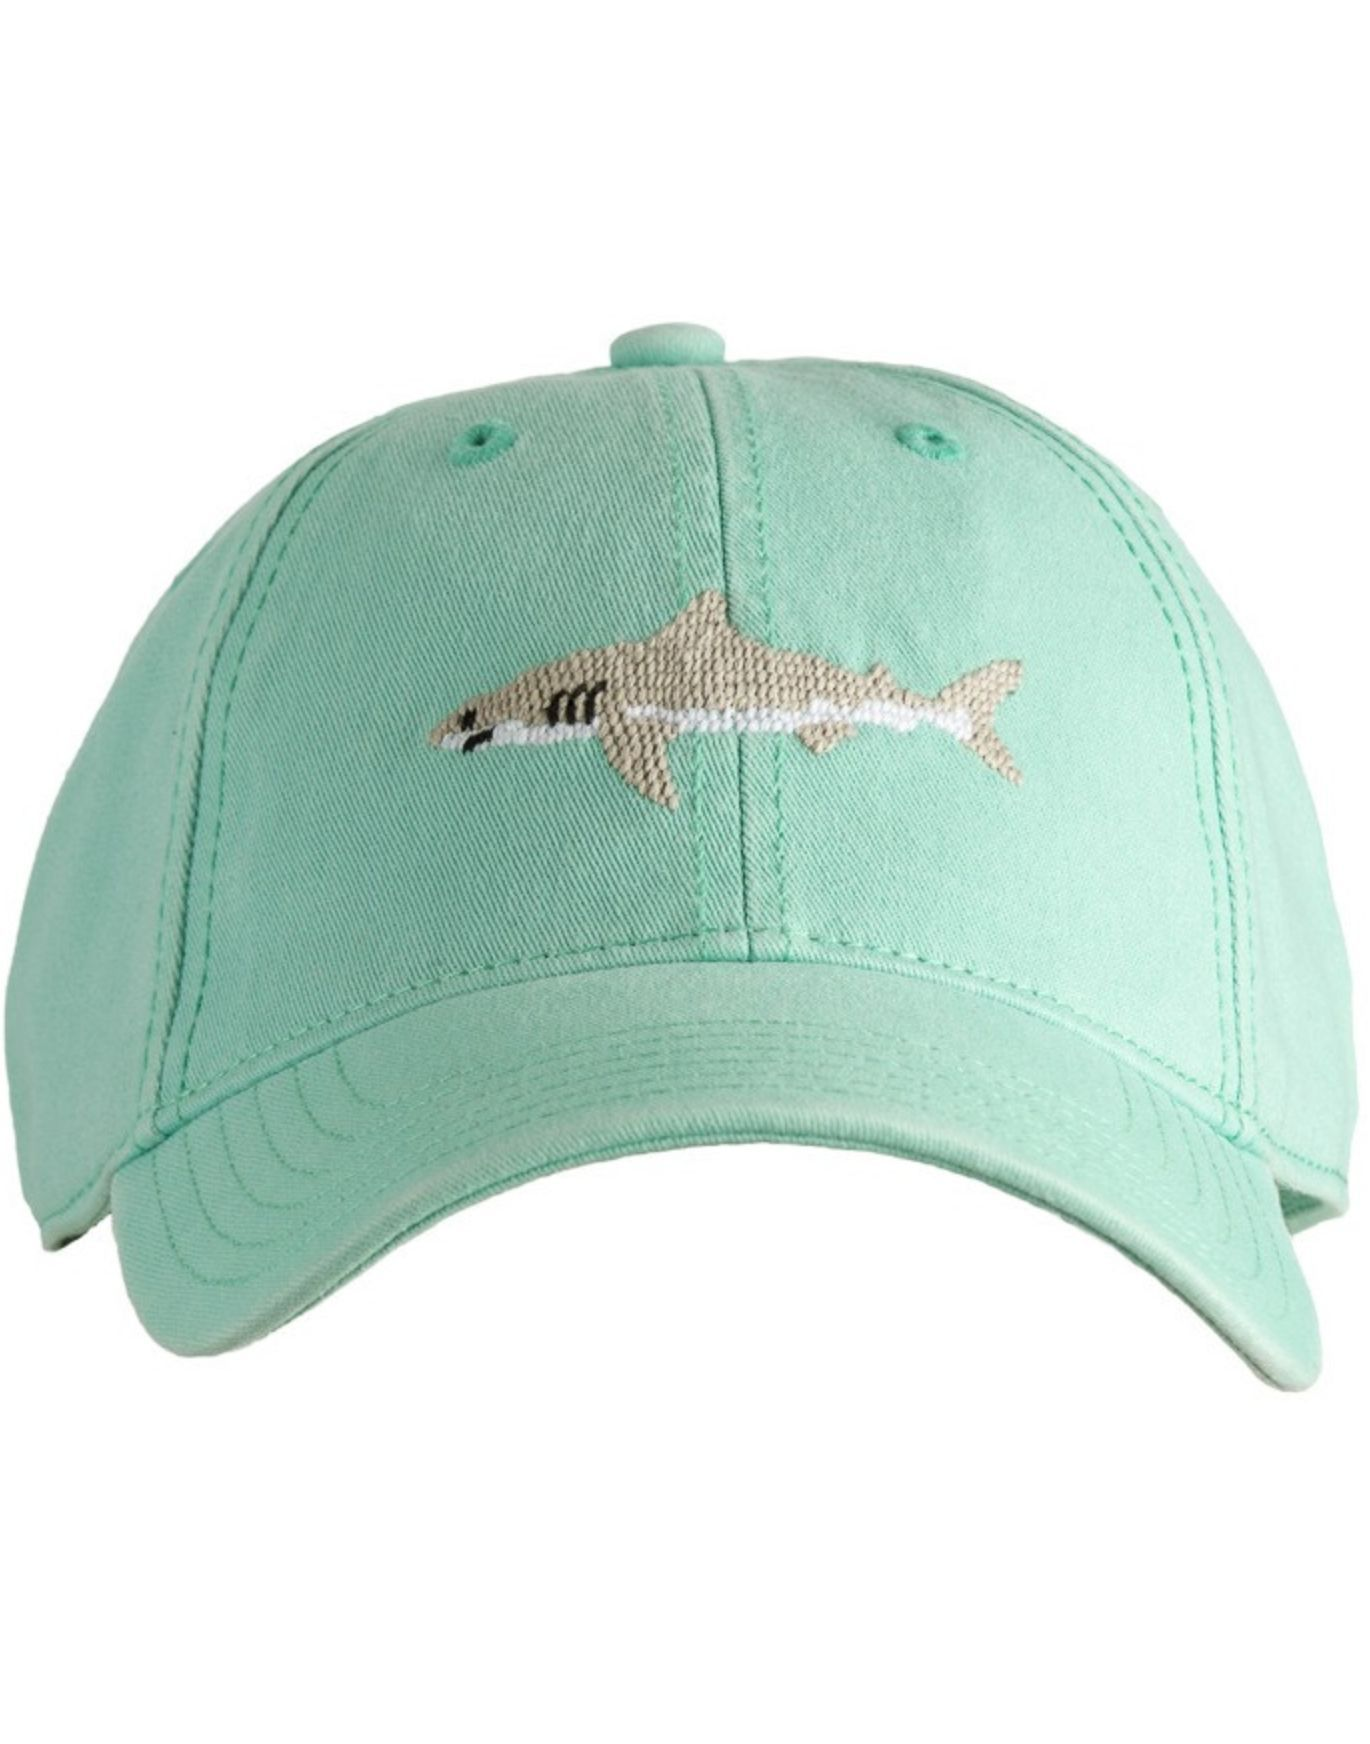 Great White Shark Ball Cap  fbe30fe2381